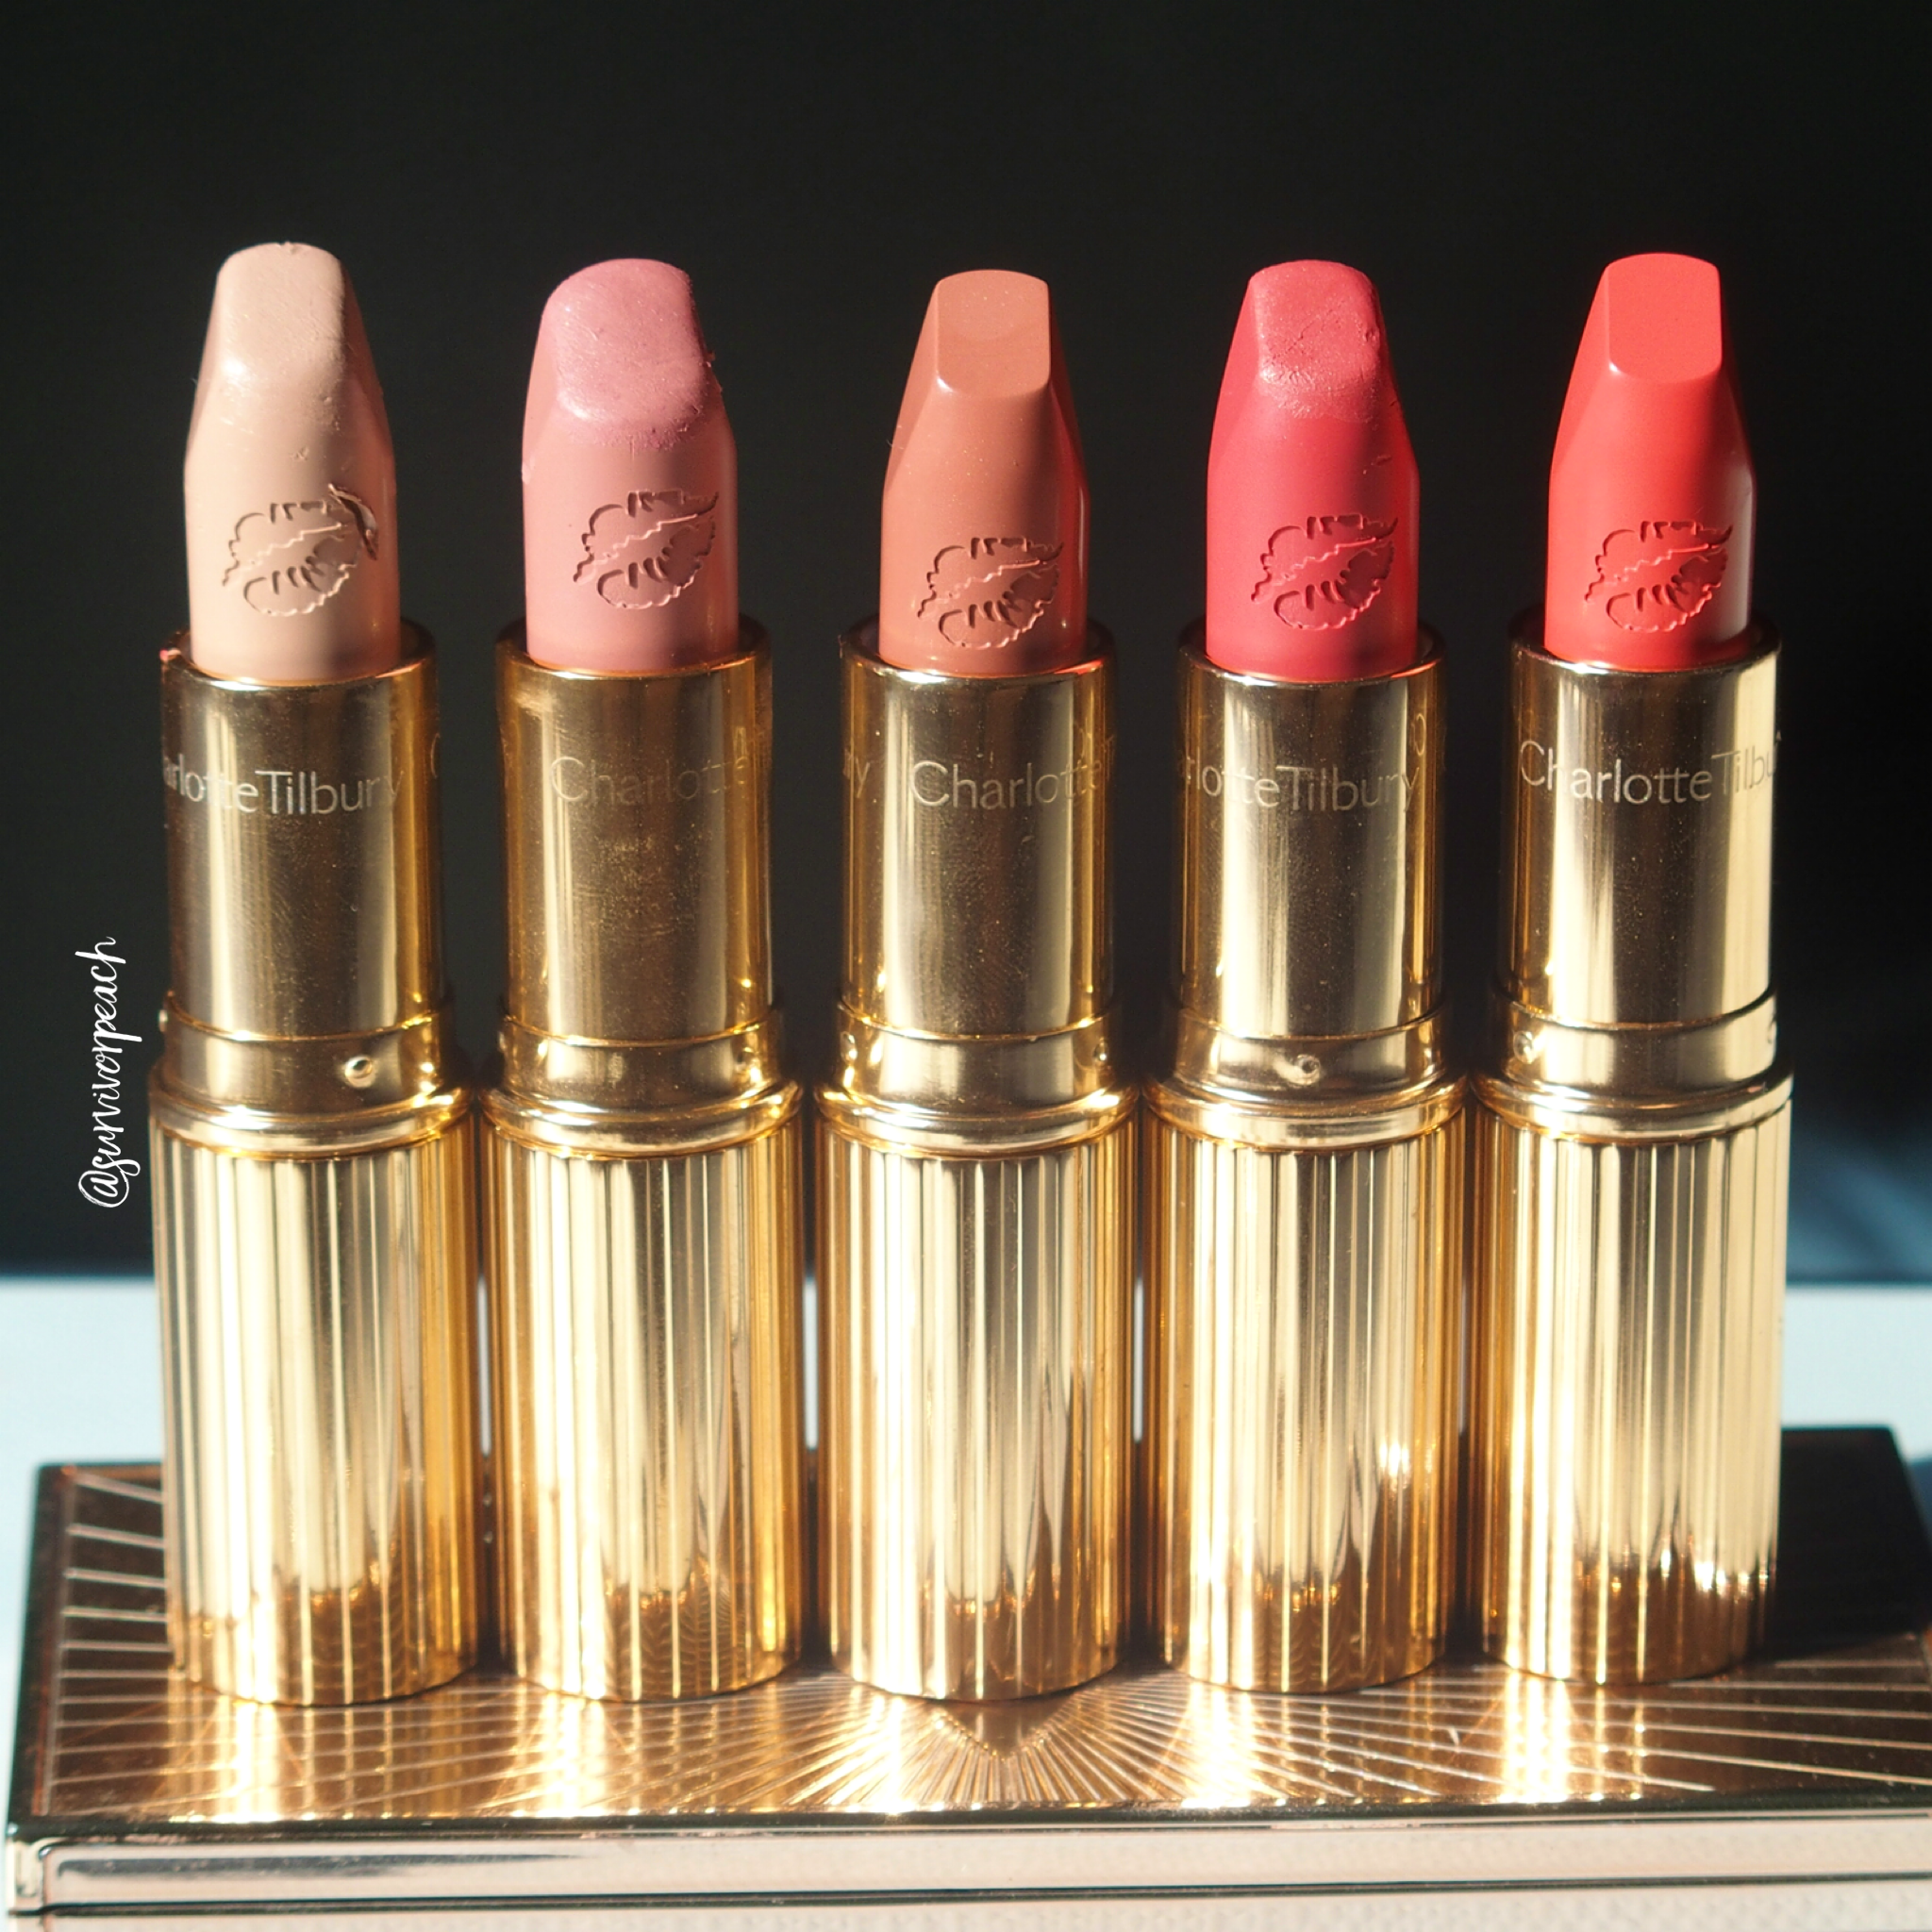 Charlotte Tilbury Hot Lips in shades Kim K.W., Kidman's Kiss, Super Cindy, Miranda May, Hot Emily.